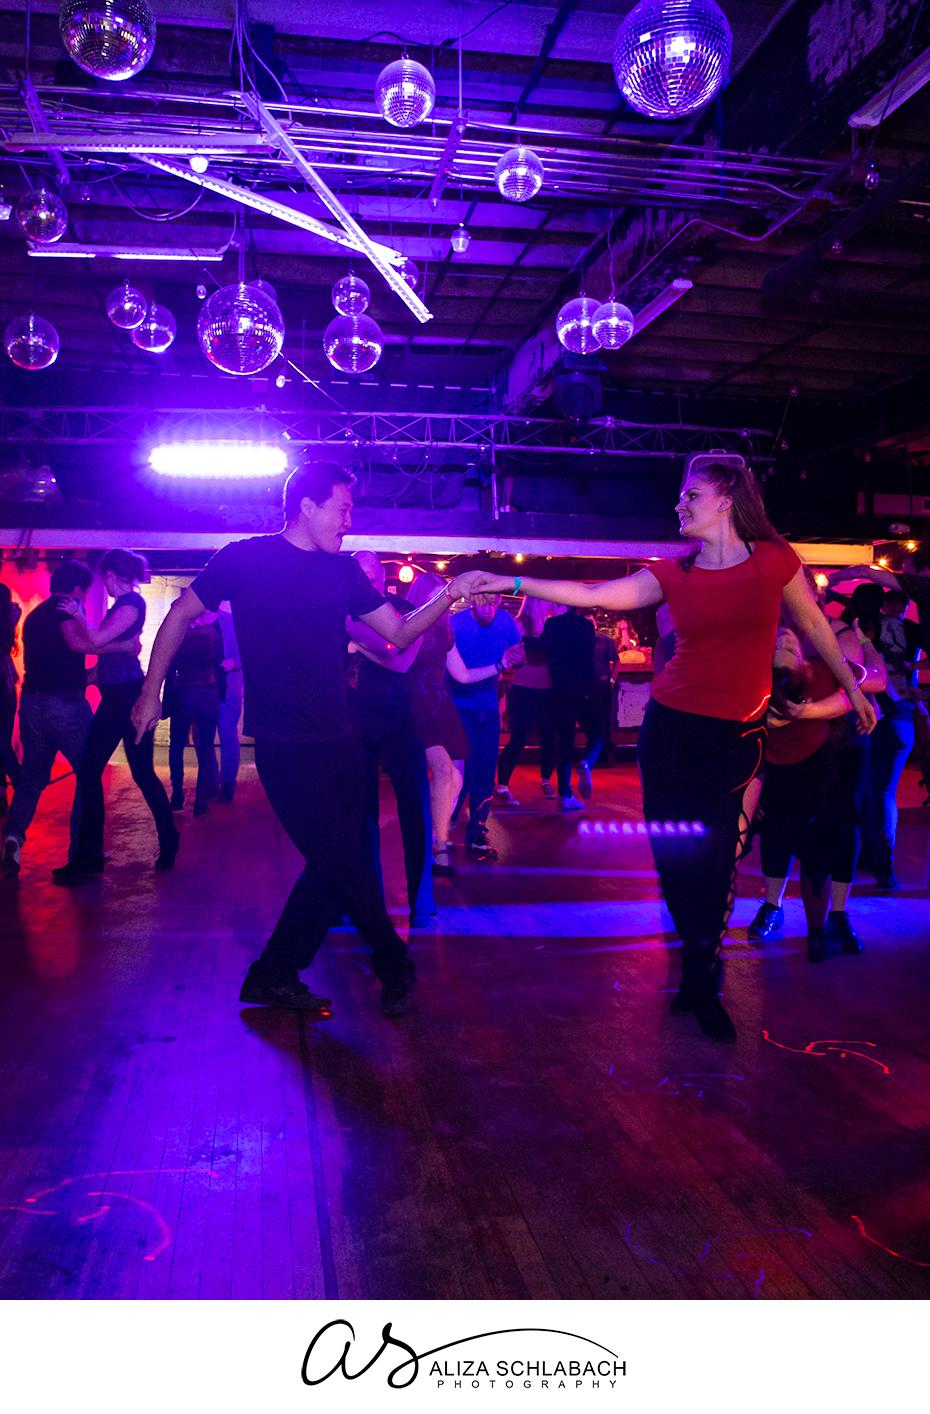 Photograph of partner dancing under disco balls